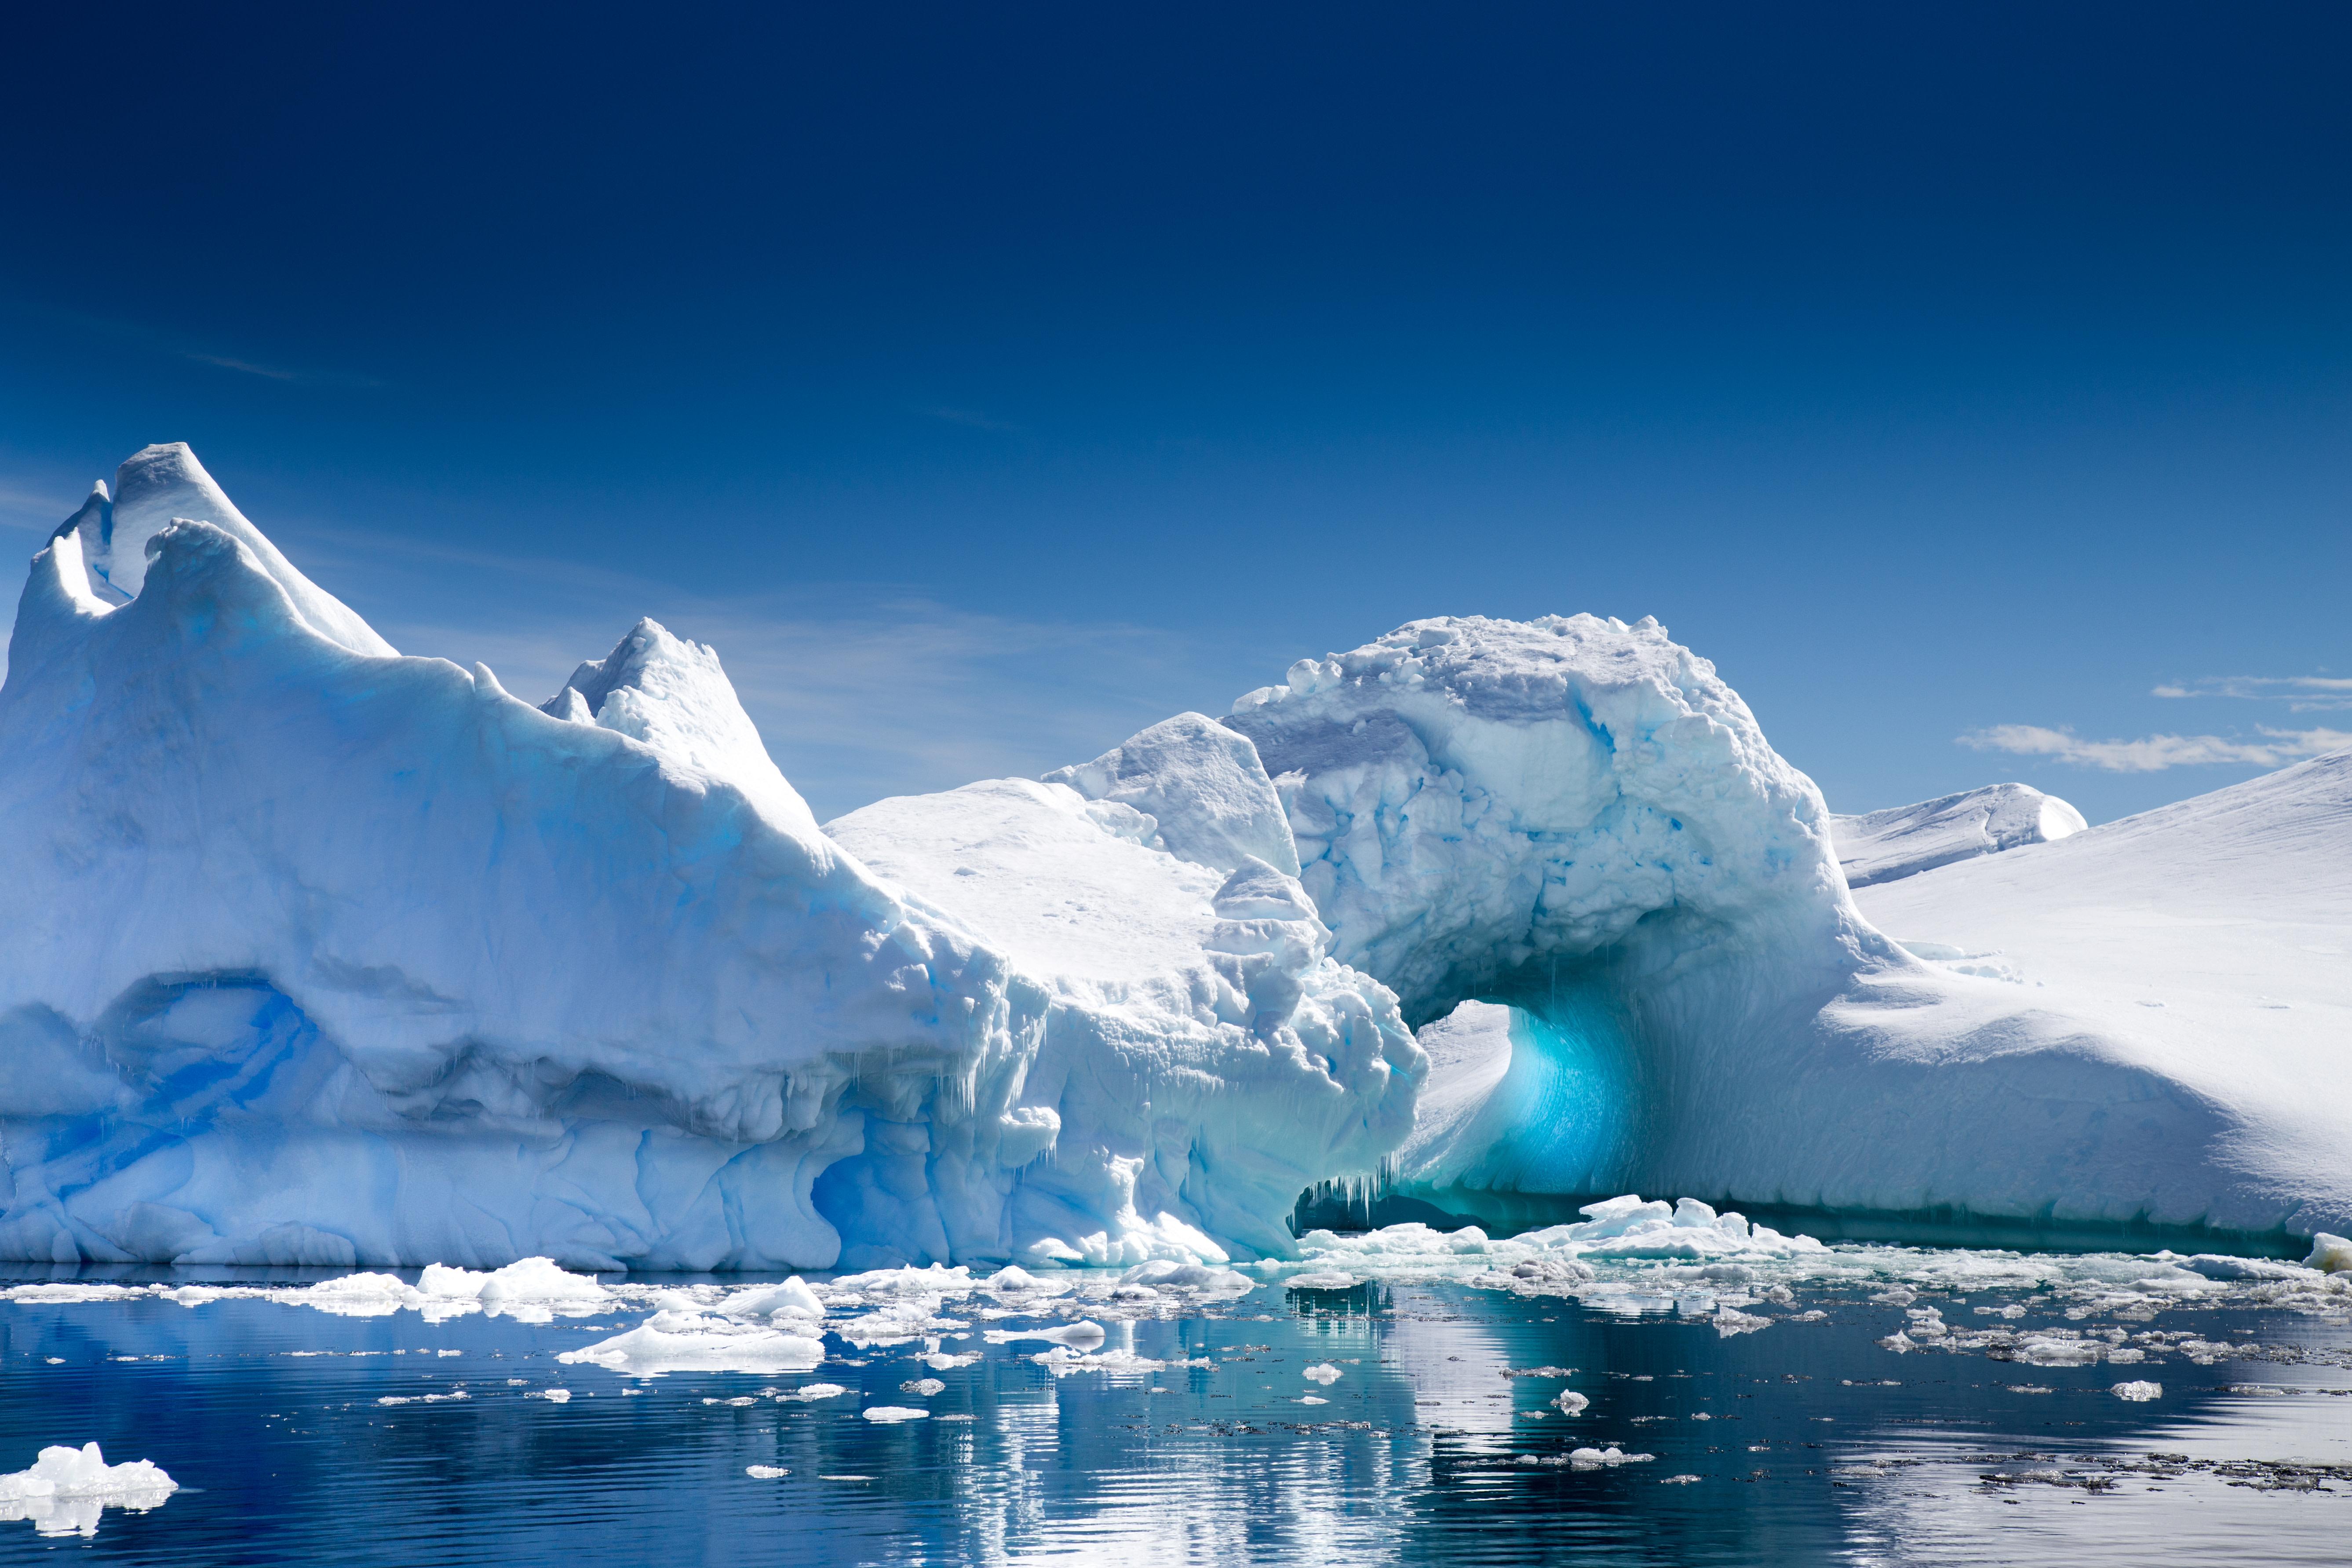 A beautiful Iceberg in Pleneau Bay, Port Charcot, Antarctica vacation